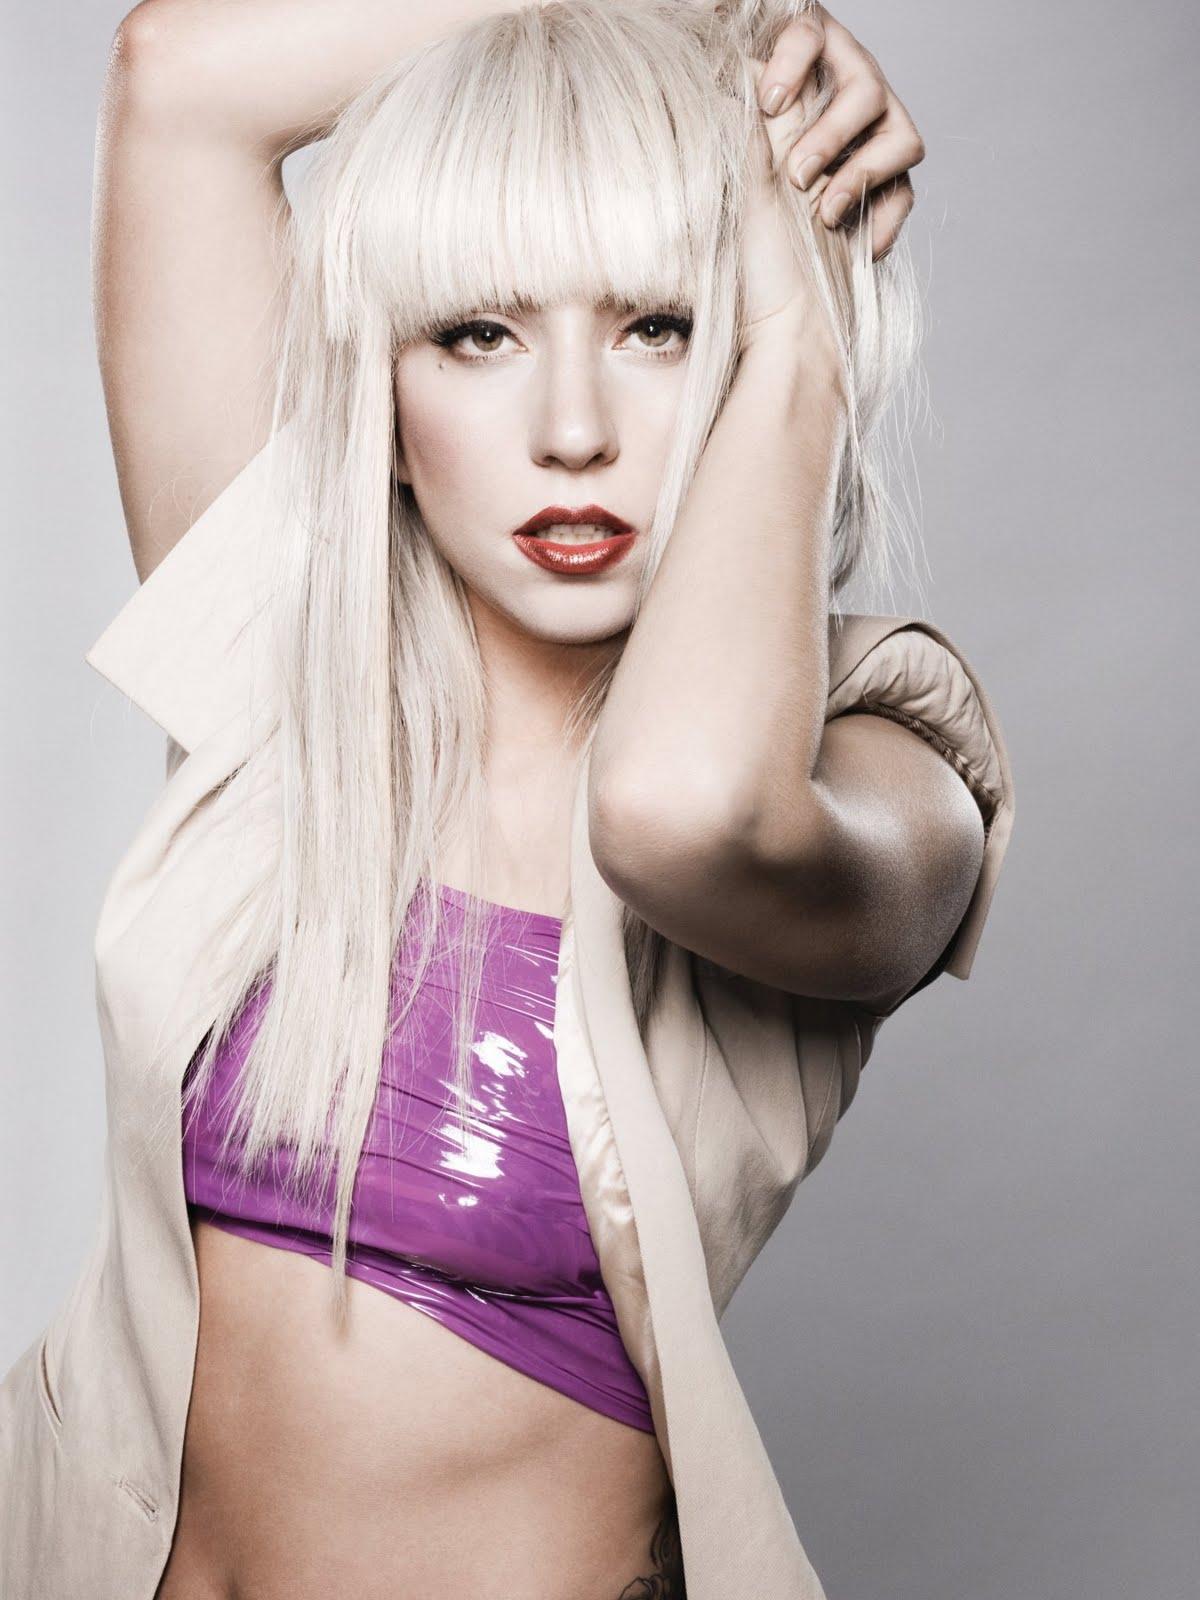 http://3.bp.blogspot.com/-c-XQde8XKQs/TcJ15mwWHqI/AAAAAAAACBk/xOwNG-_z_eE/s1600/Top+Fashion+Statements+-+lady+gaga+1.jpg